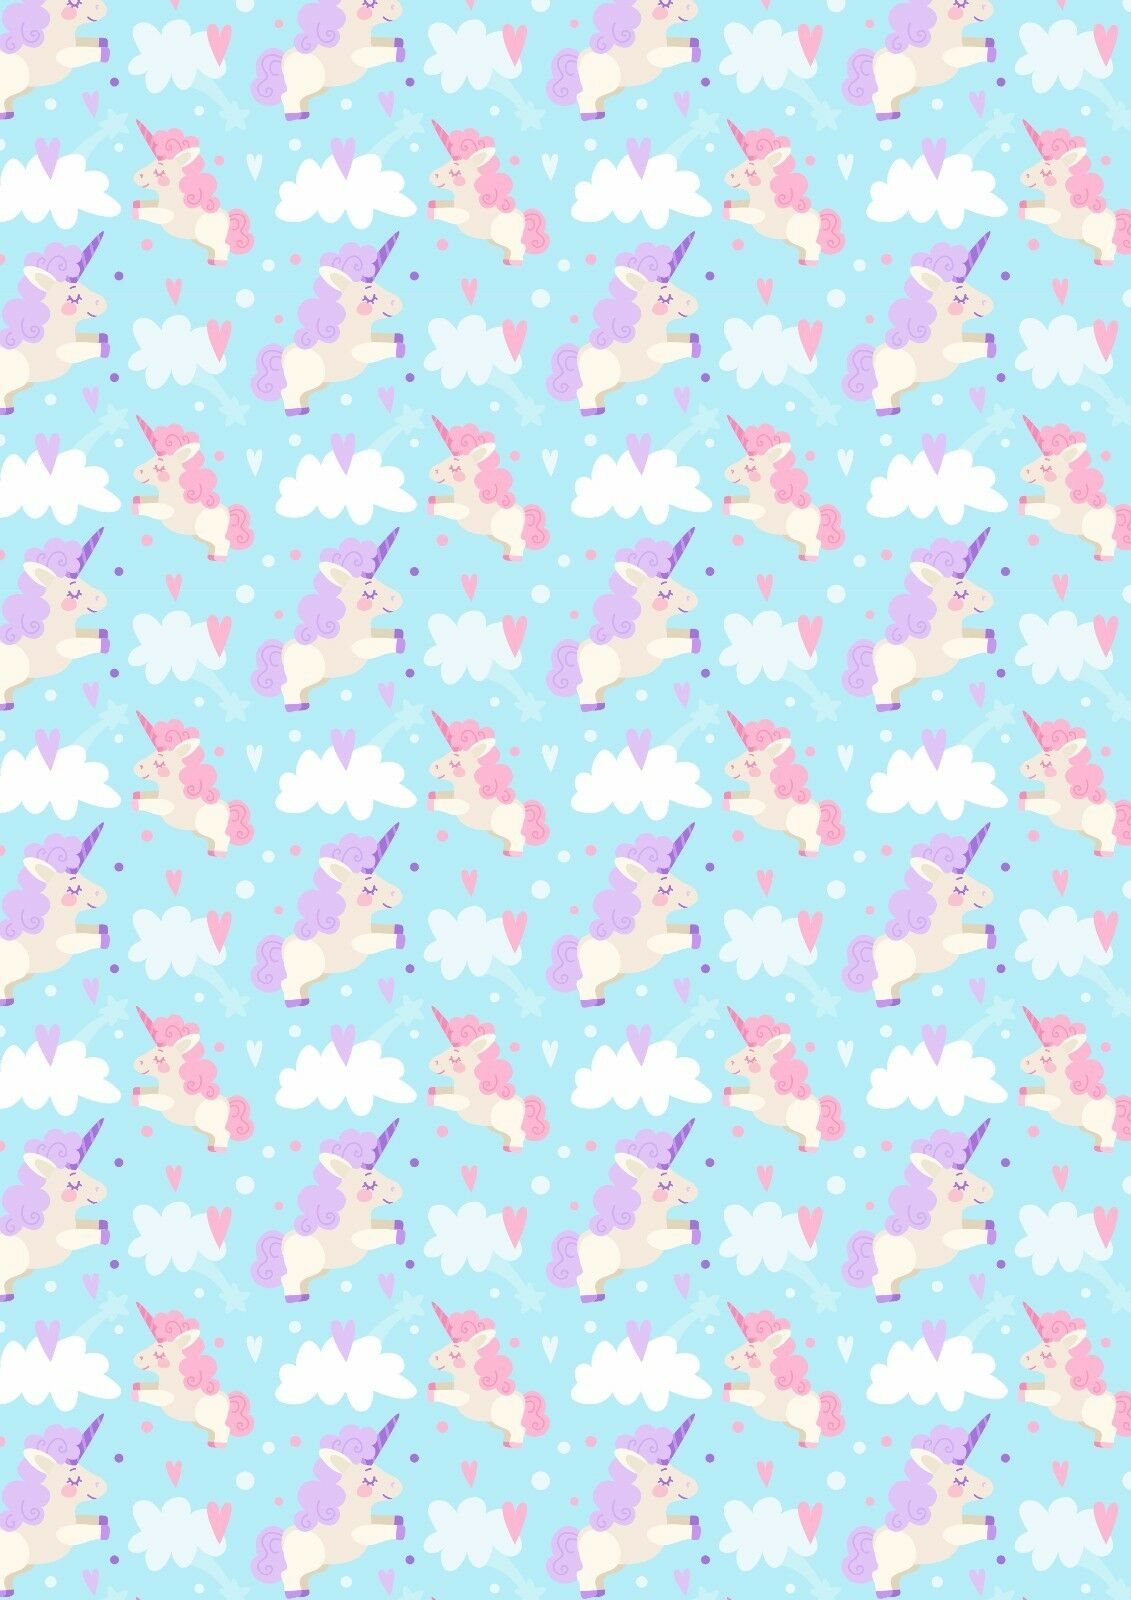 Unicorn Rainbows Fabric Sheet Canvas Bow Making Craft Hair Bows